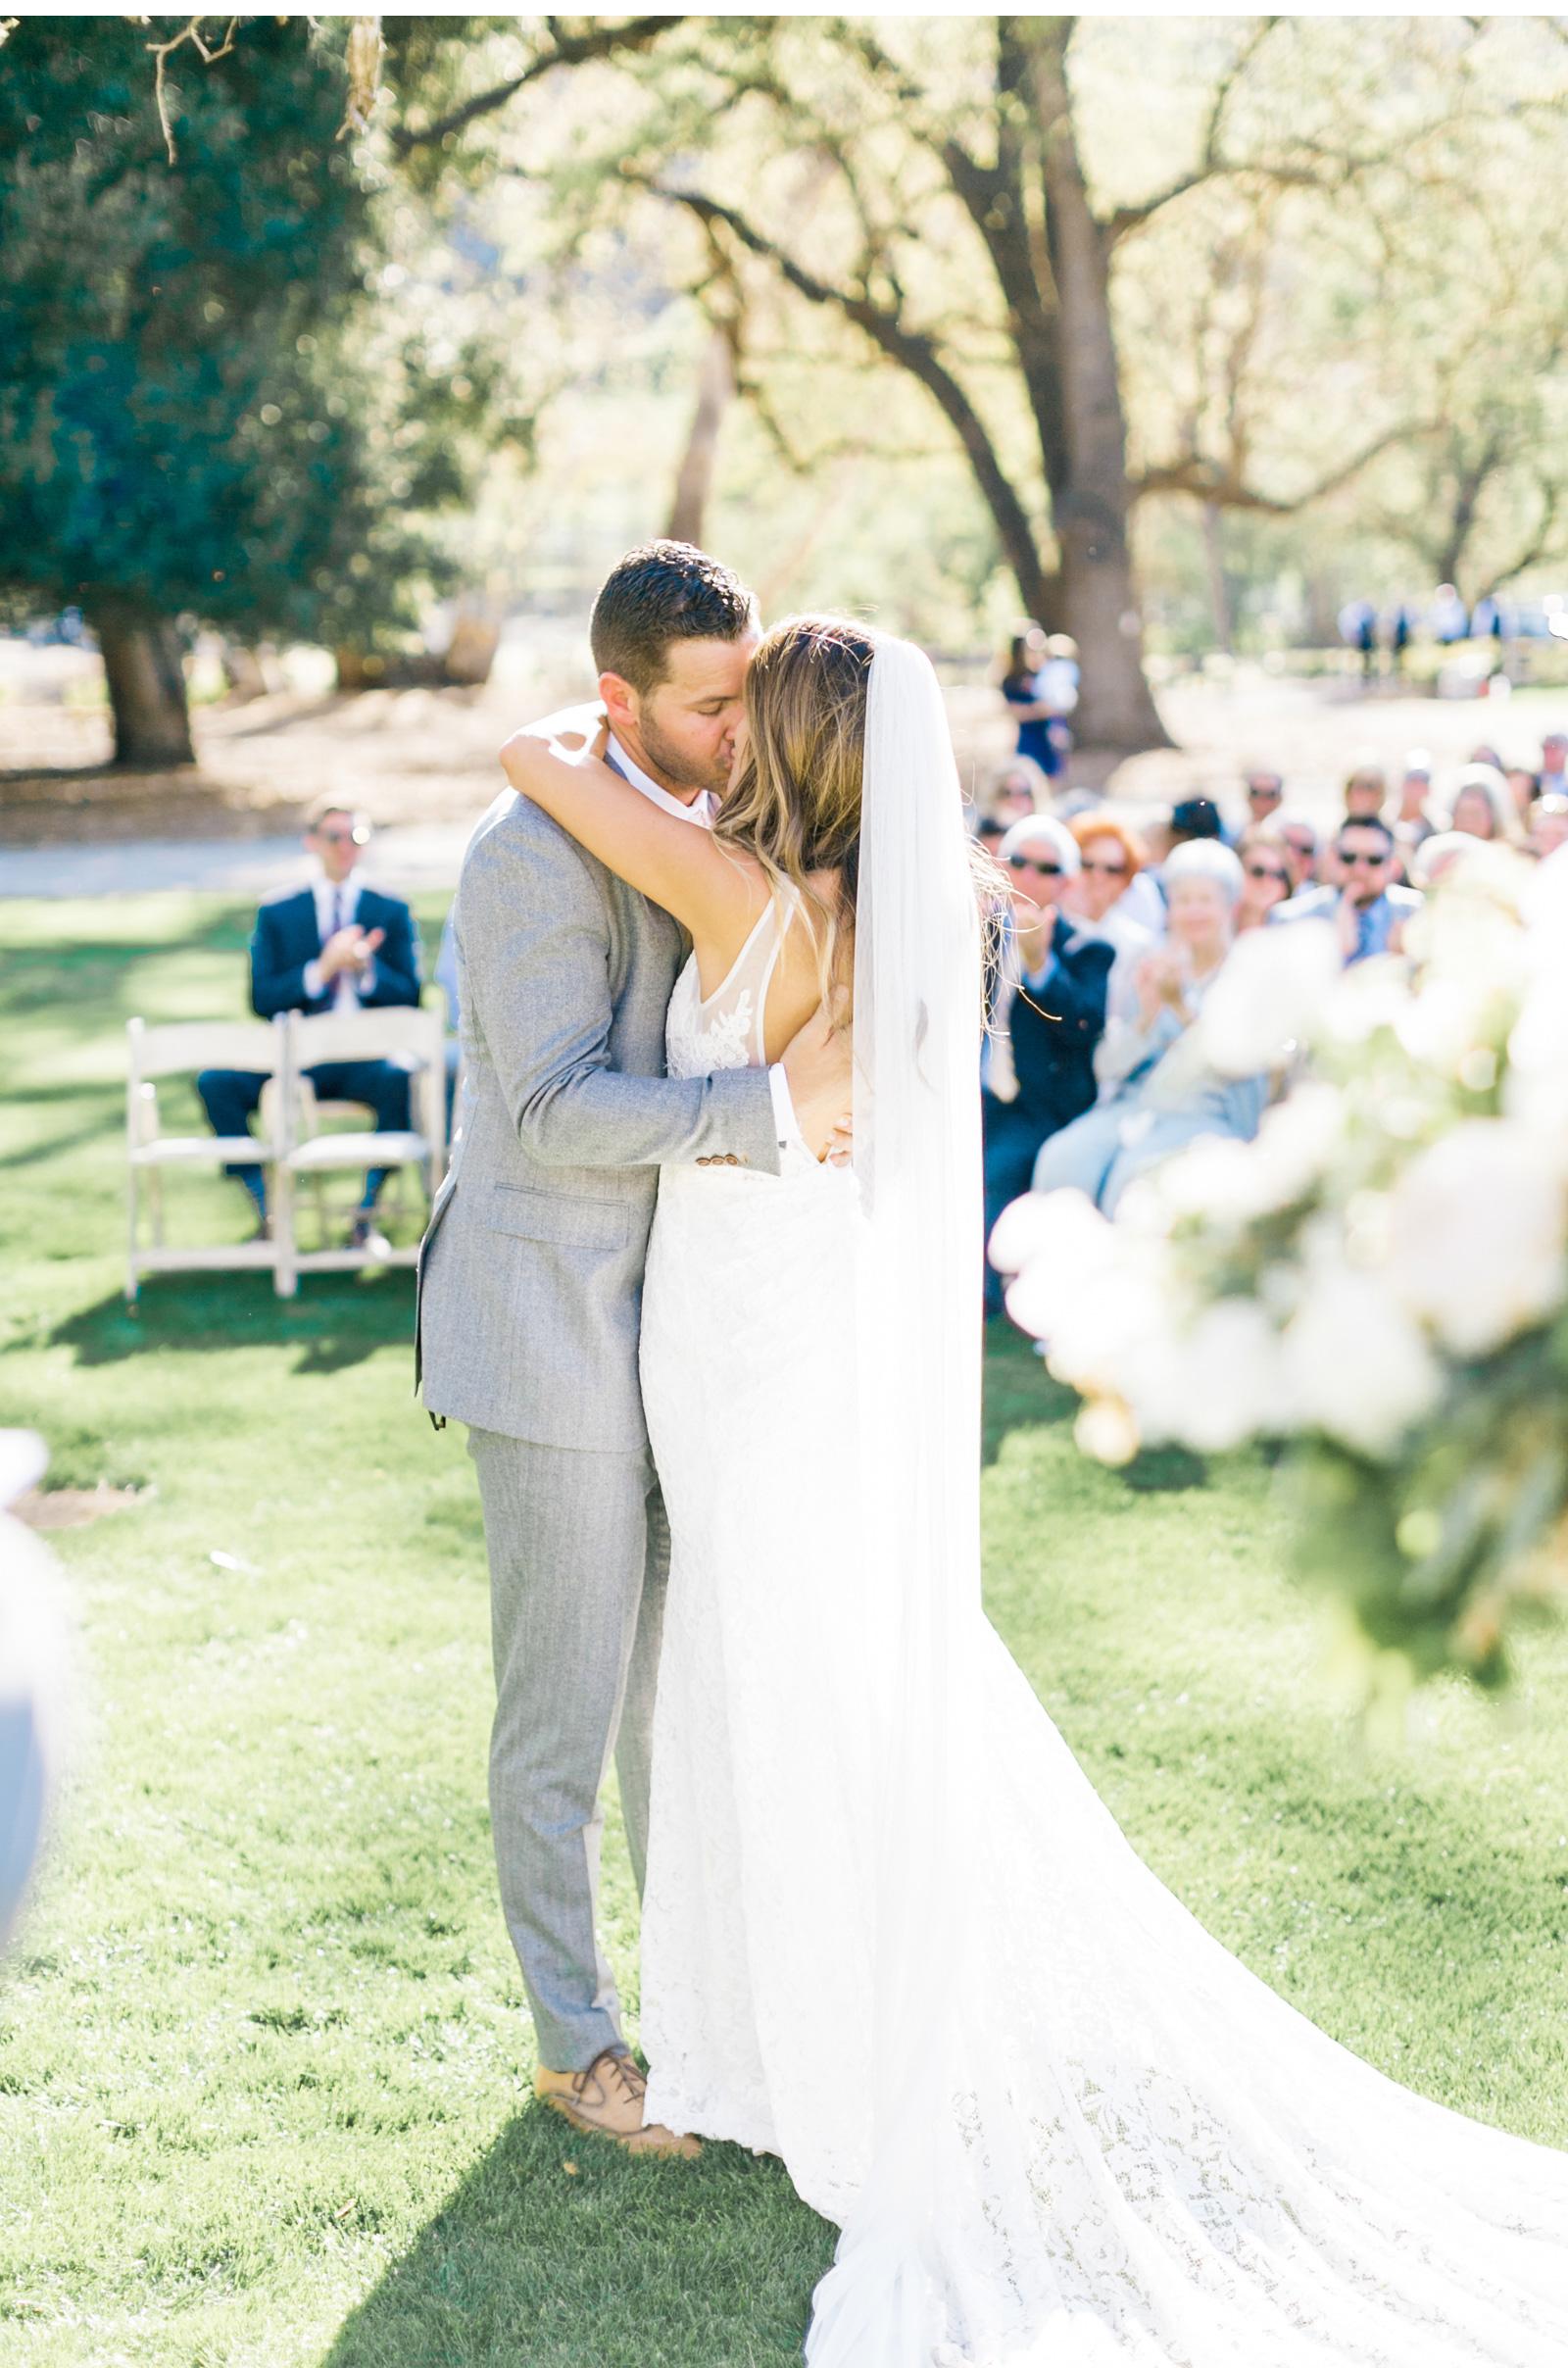 Malibu-Wedding-Photographer-Triunfo-Creek-Natalie-Schutt-Photography_10.jpg